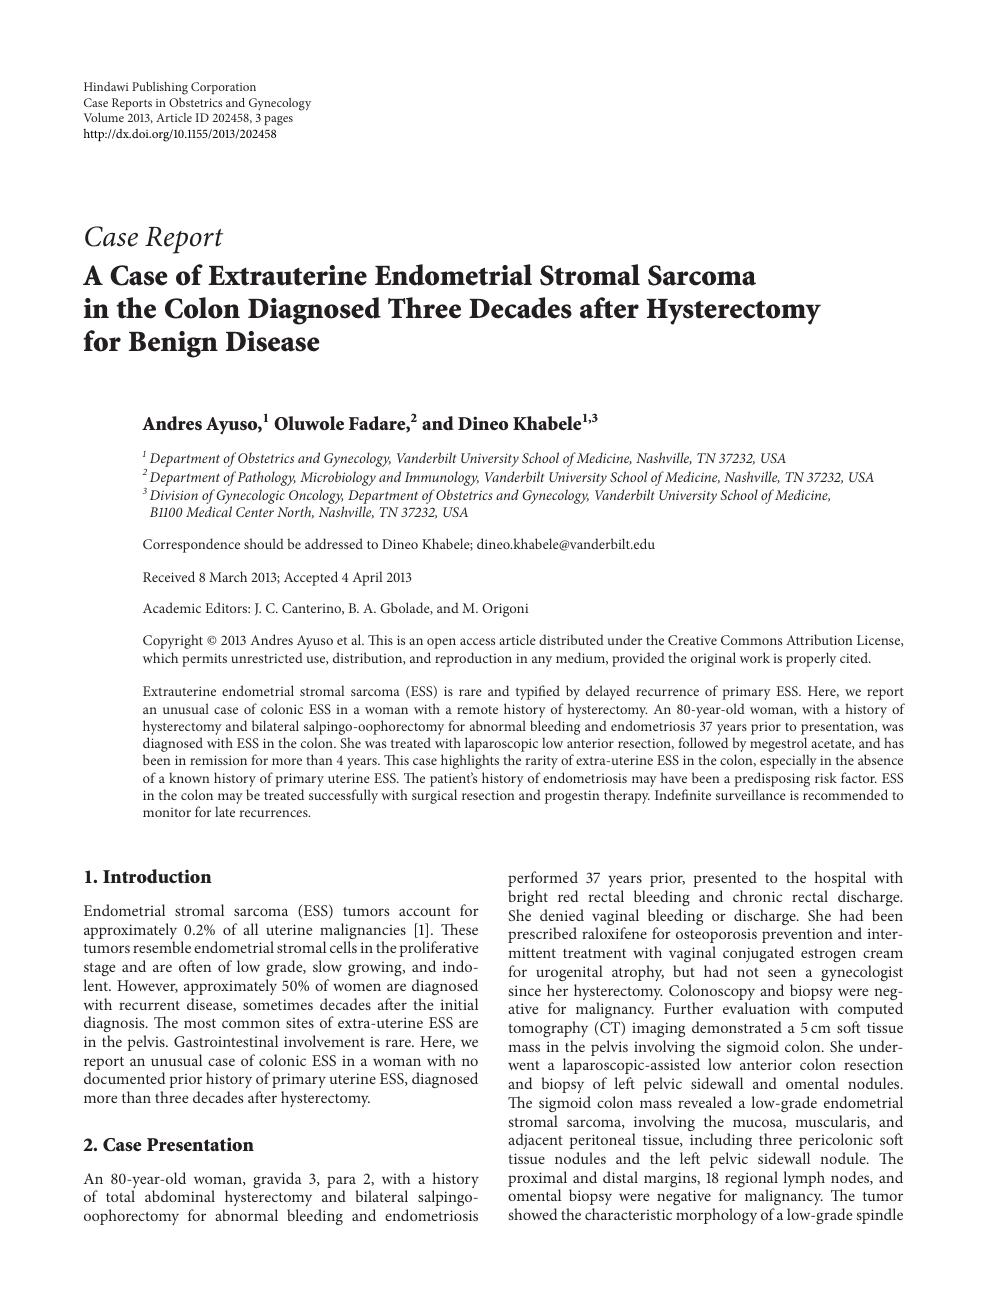 A Case of Extrauterine Endometrial Stromal Sarcoma in the